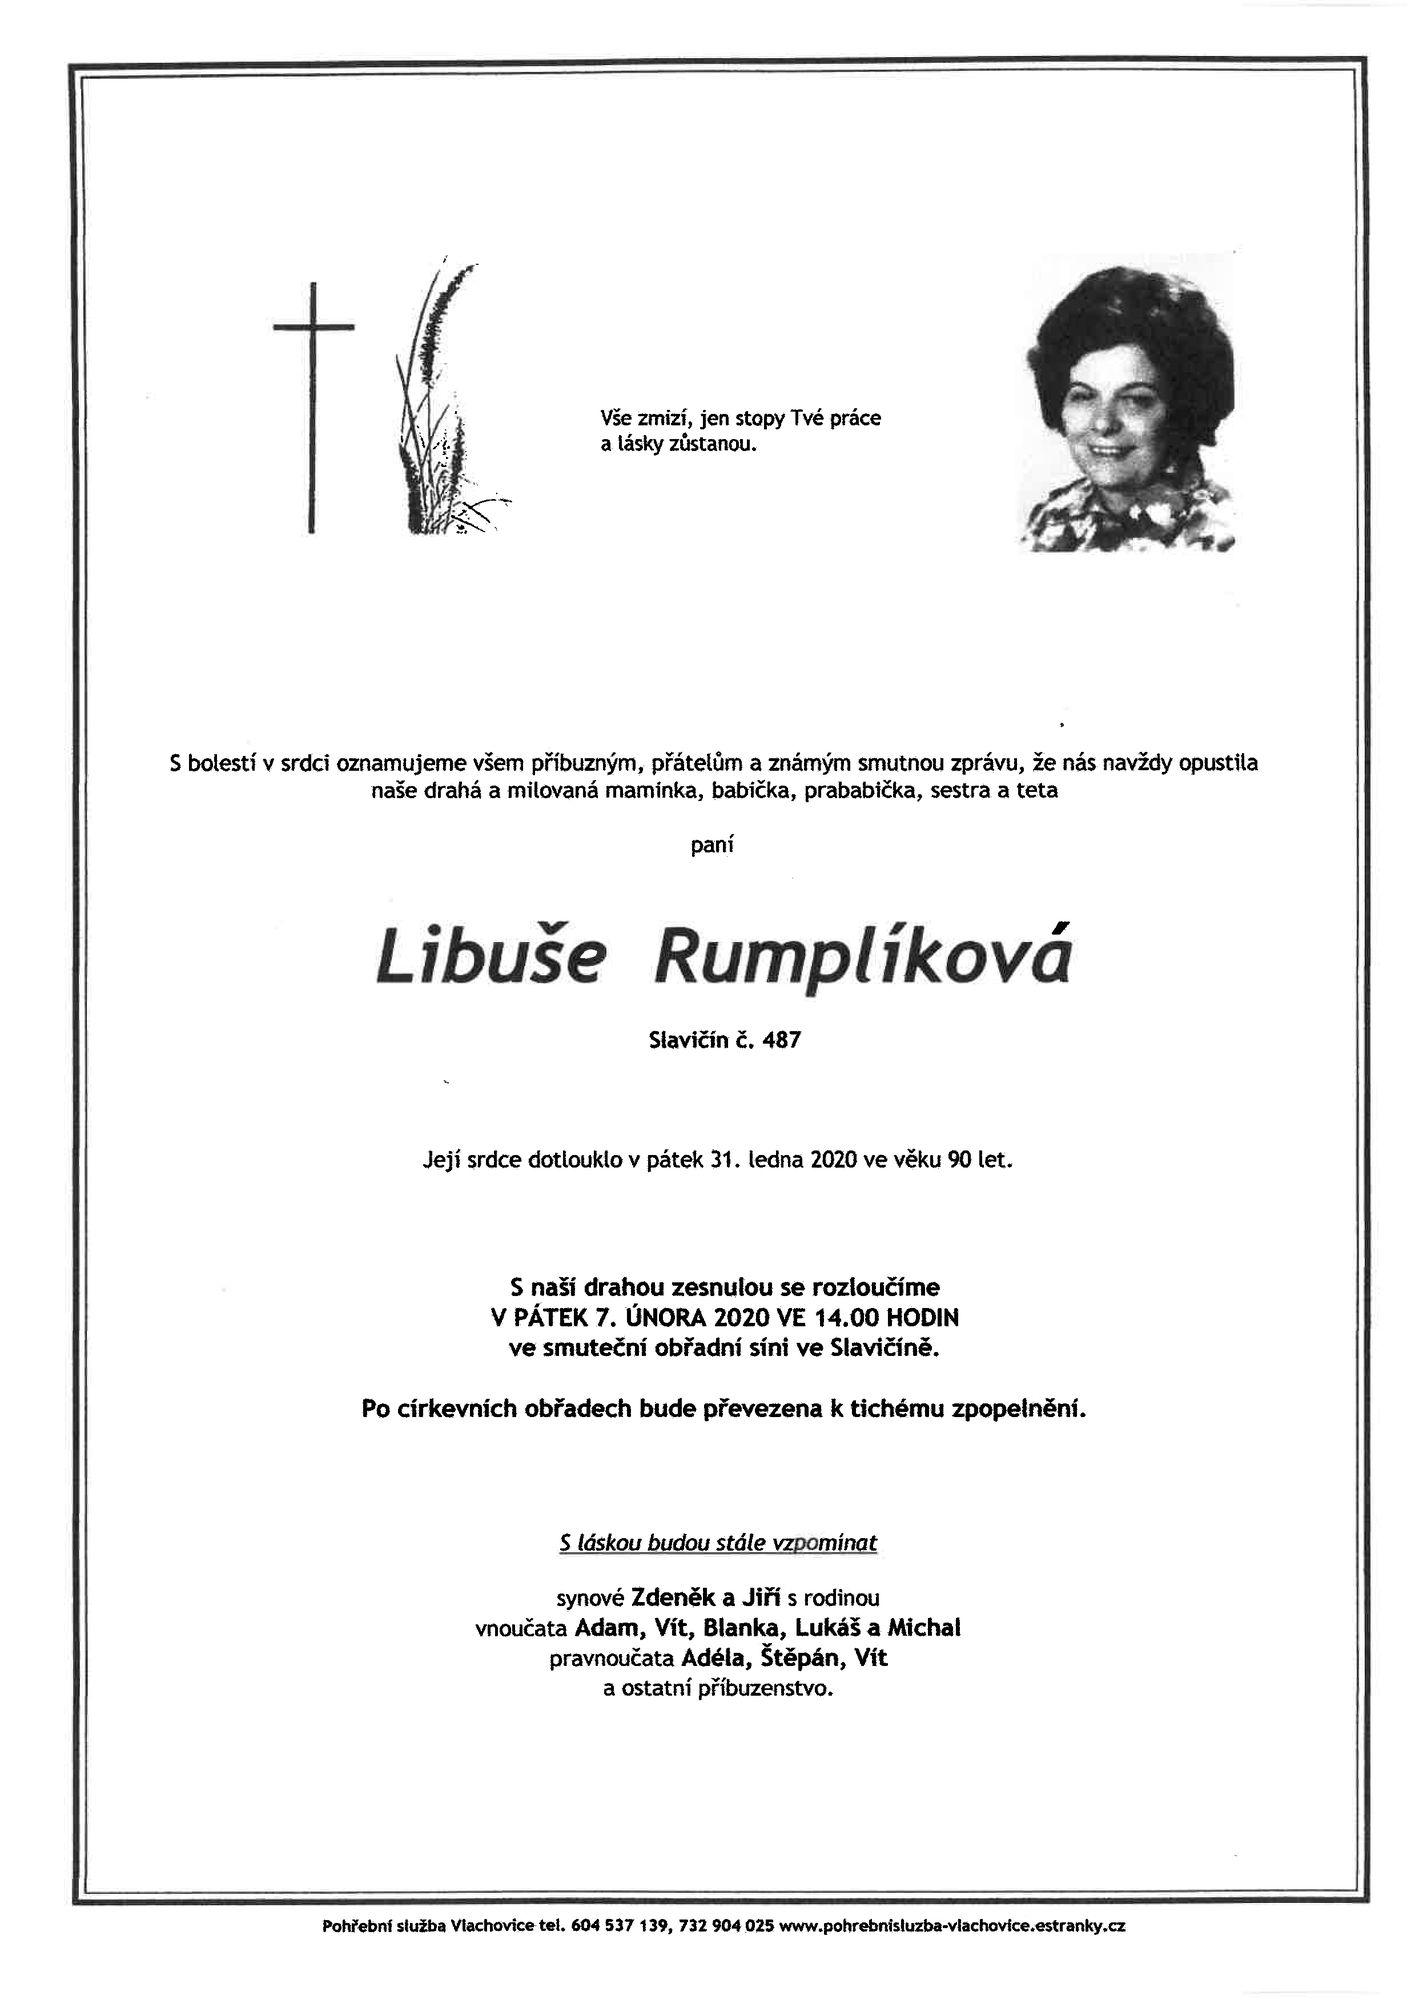 Libuše Rumplíková